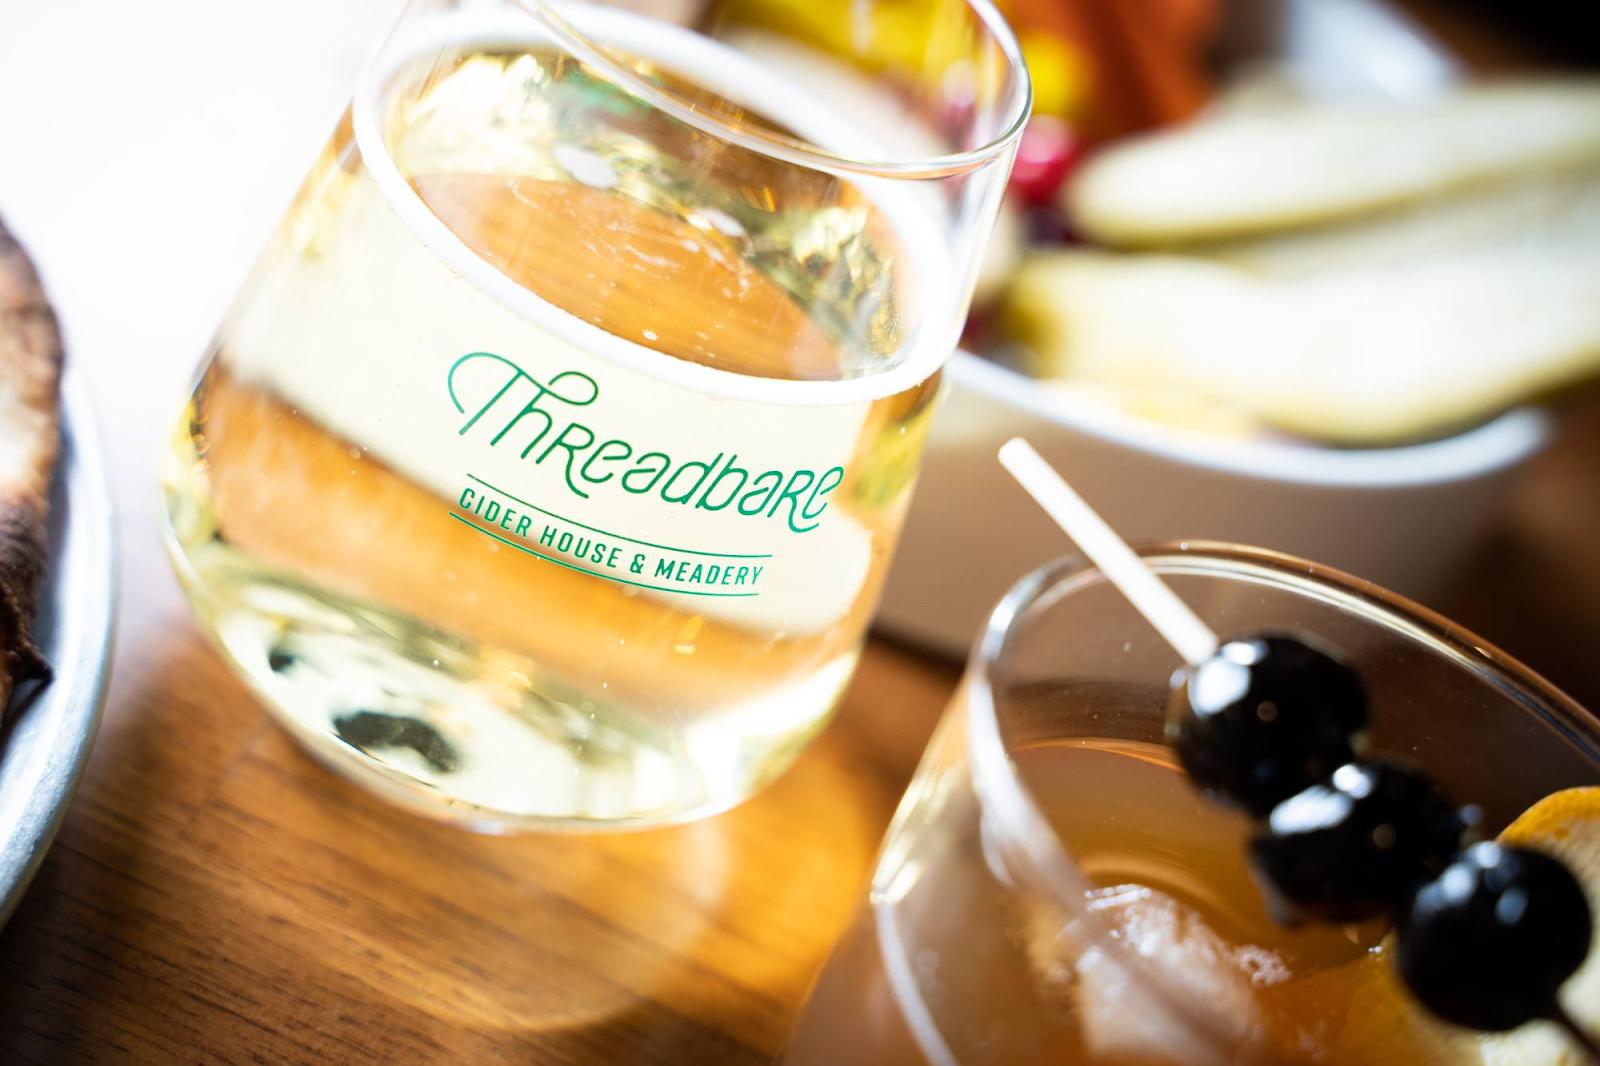 Threadbare Cider house and Meadery